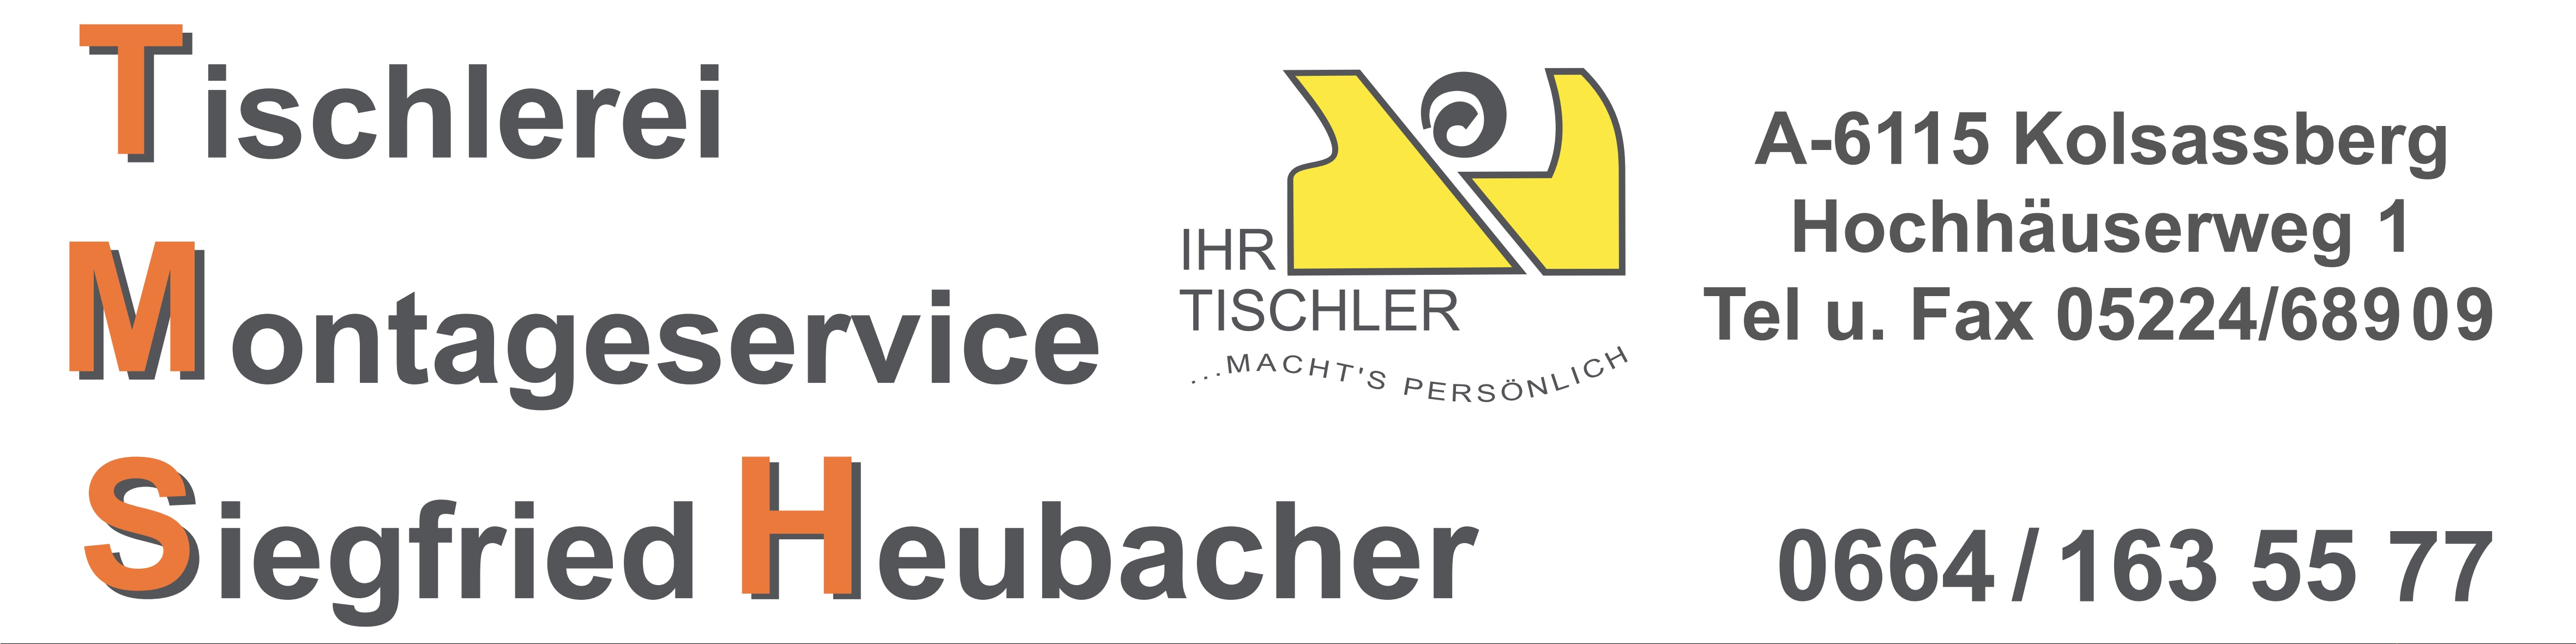 Tischlerei-Montageservice Heubacher